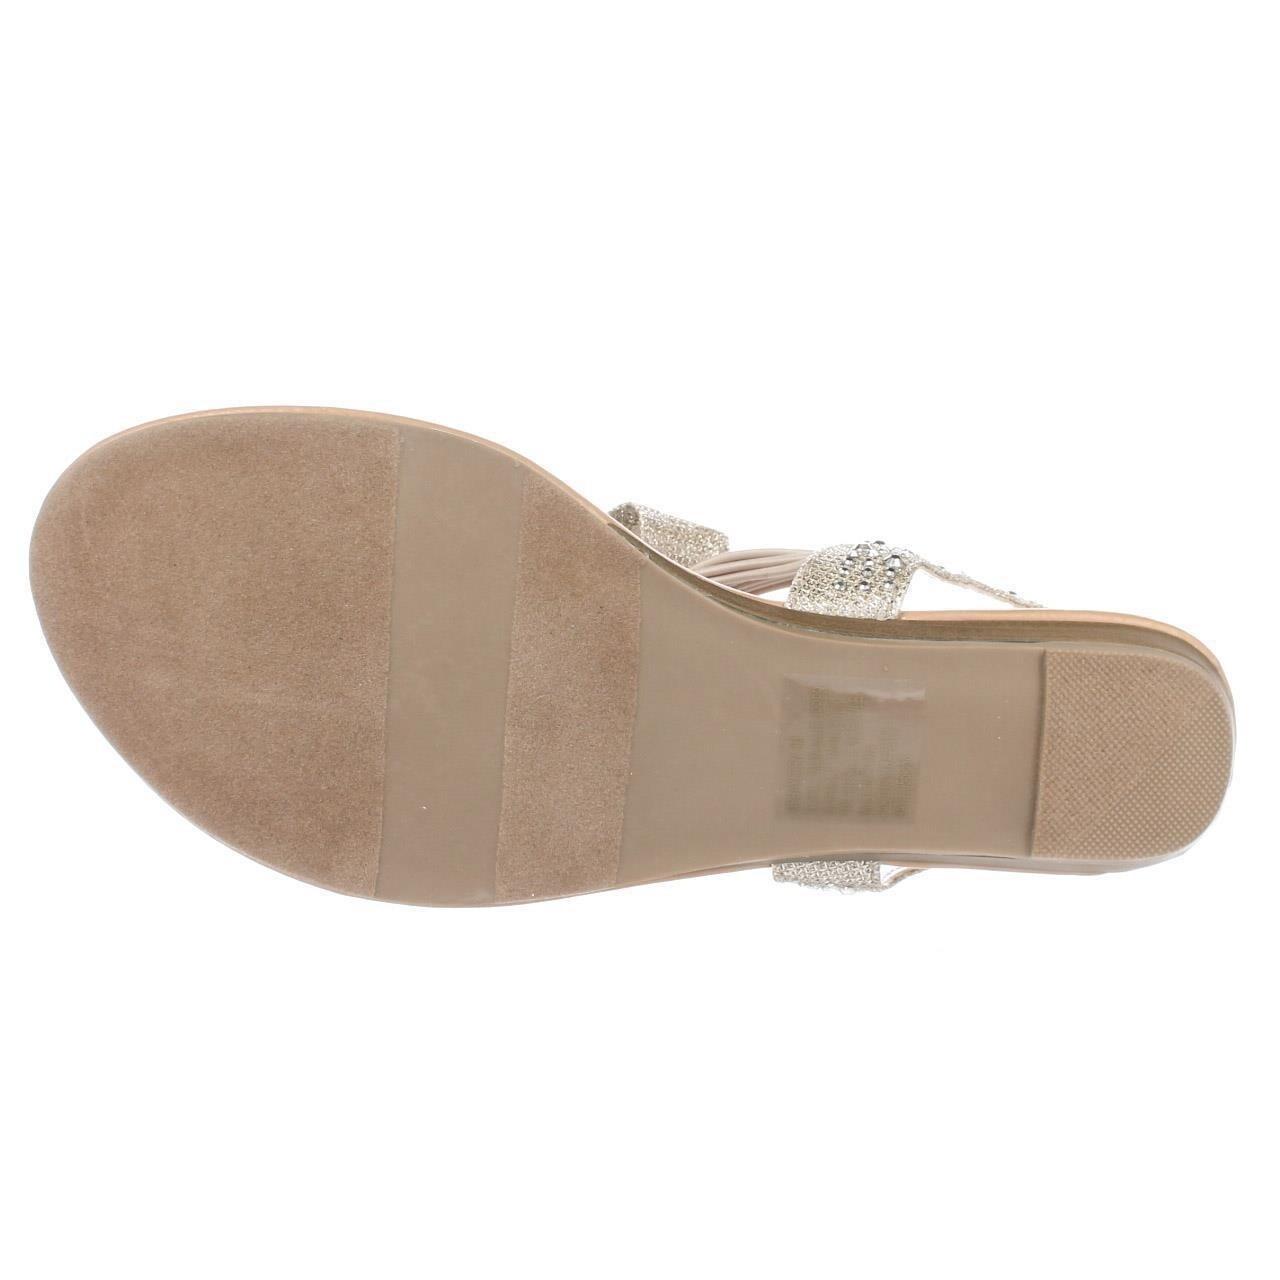 f05b48812bf5 Shop MG35 Shayleen Rhinestone Bow T-Strap Sandals